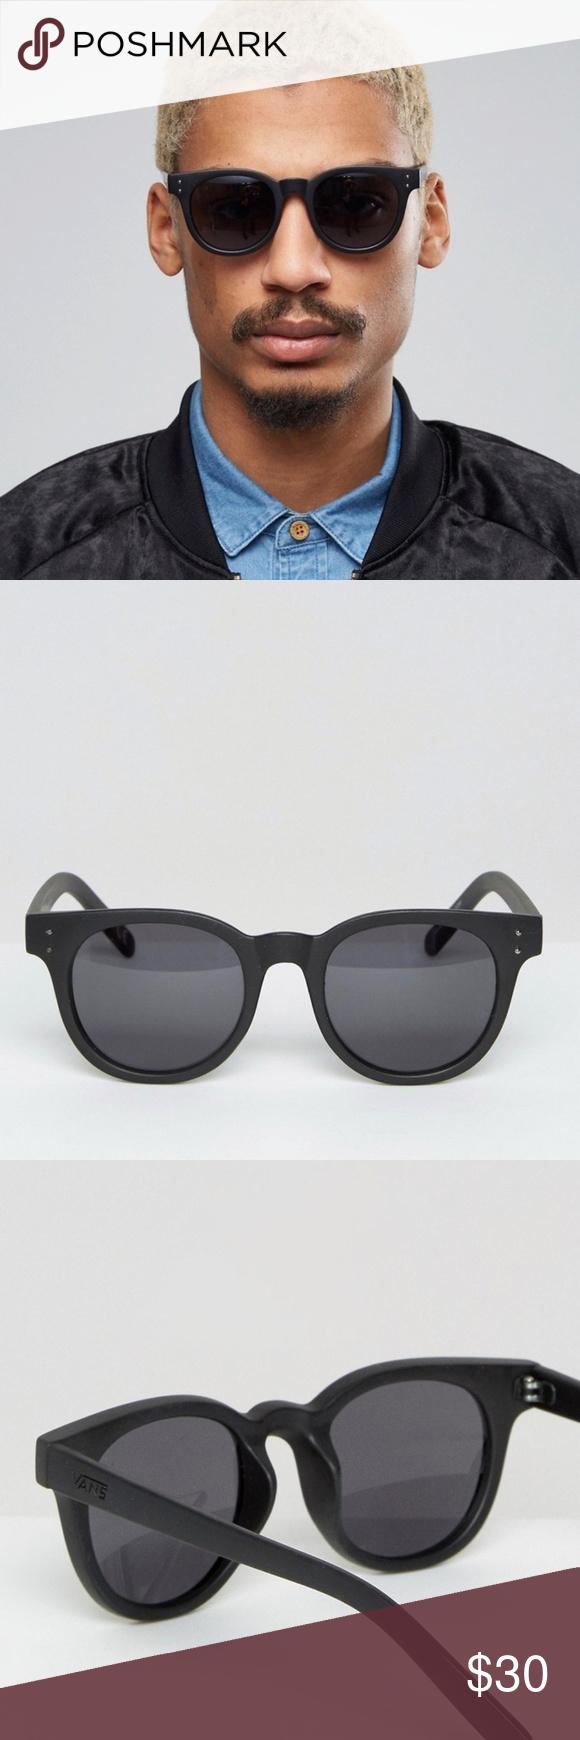 3a5f1a41d5 Vans Welborn Sunglasses In Black V5yoblk New Vans Welborn Sunglasses In  Black V5yoblk Vans Accessories Sunglasses